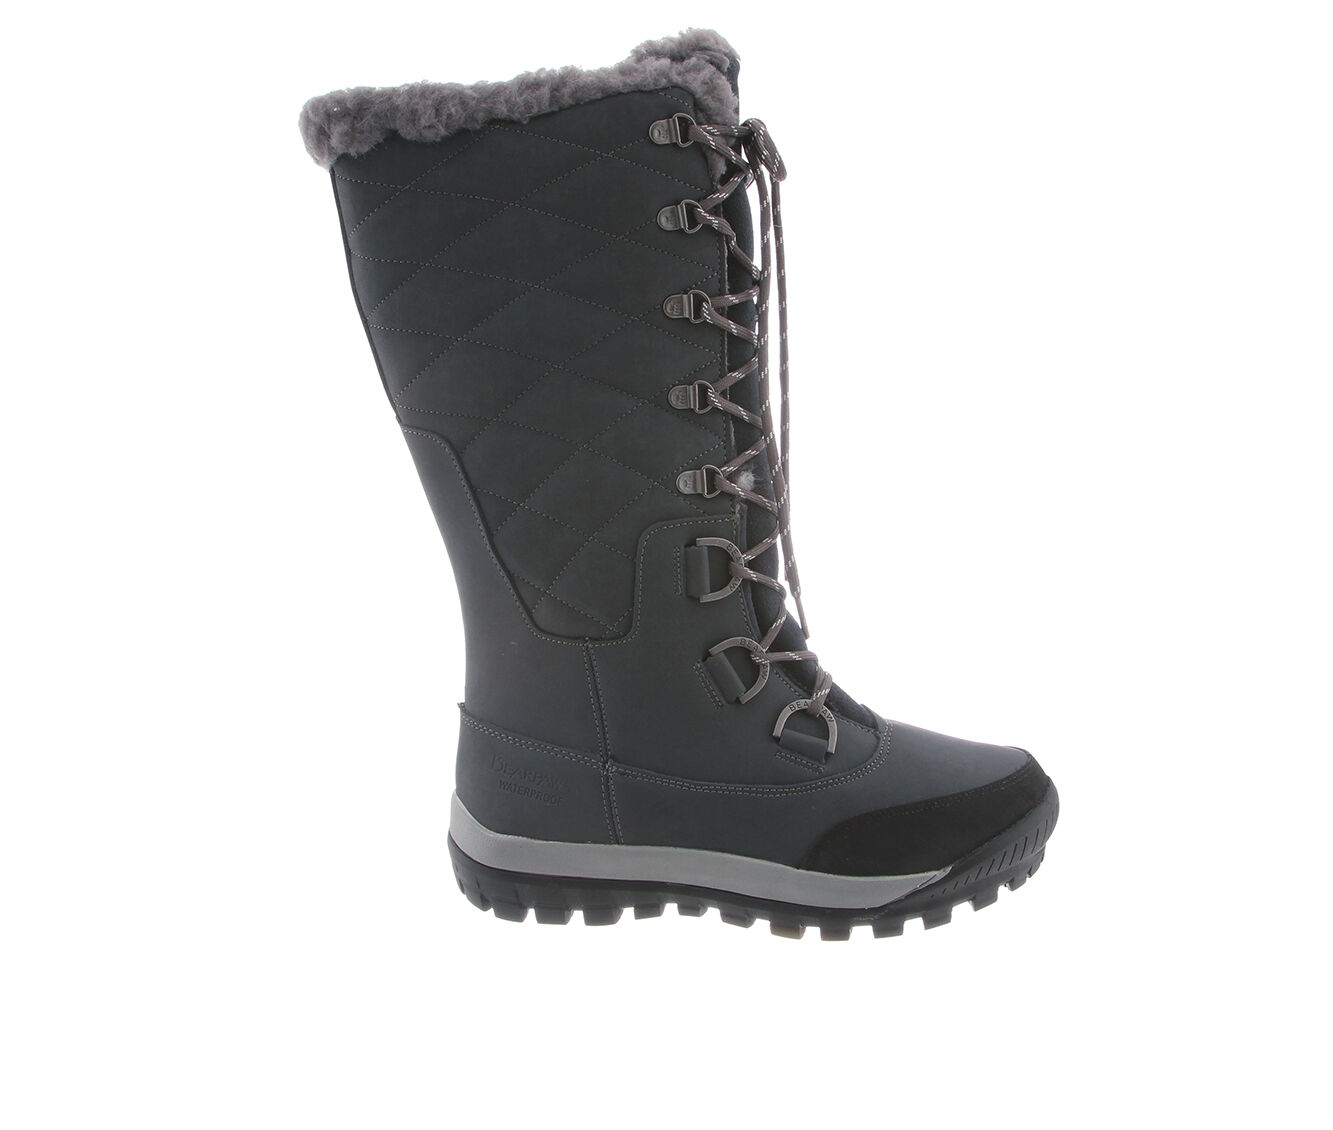 get comfortable cheap Women's Bearpaw Isabella Winter Boots Charcoal